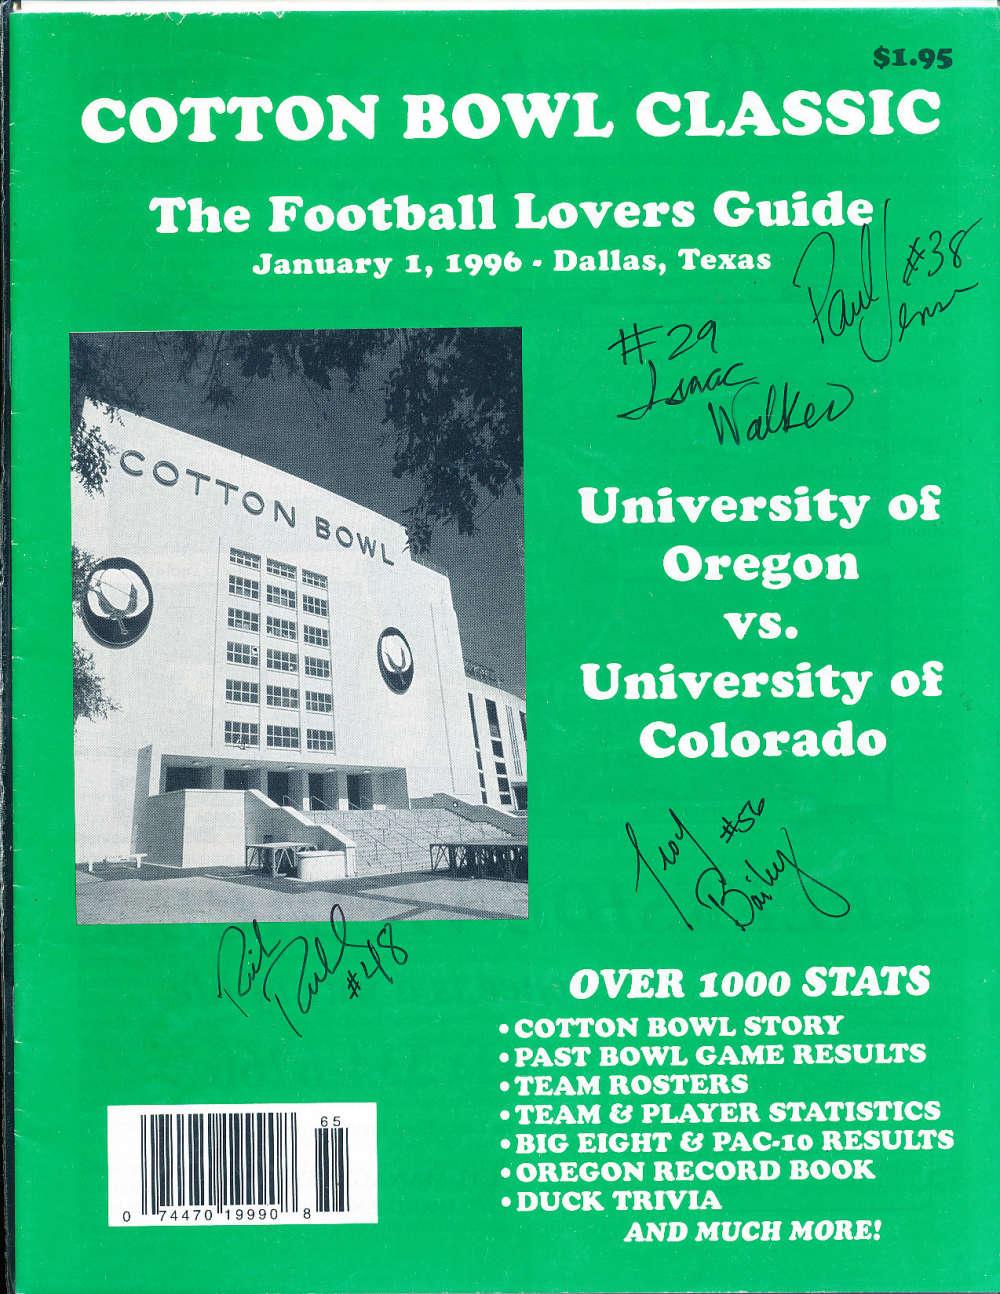 1/1 1996 Cotton Bowl Classic Oregon vs Colorado guide signed 4 players